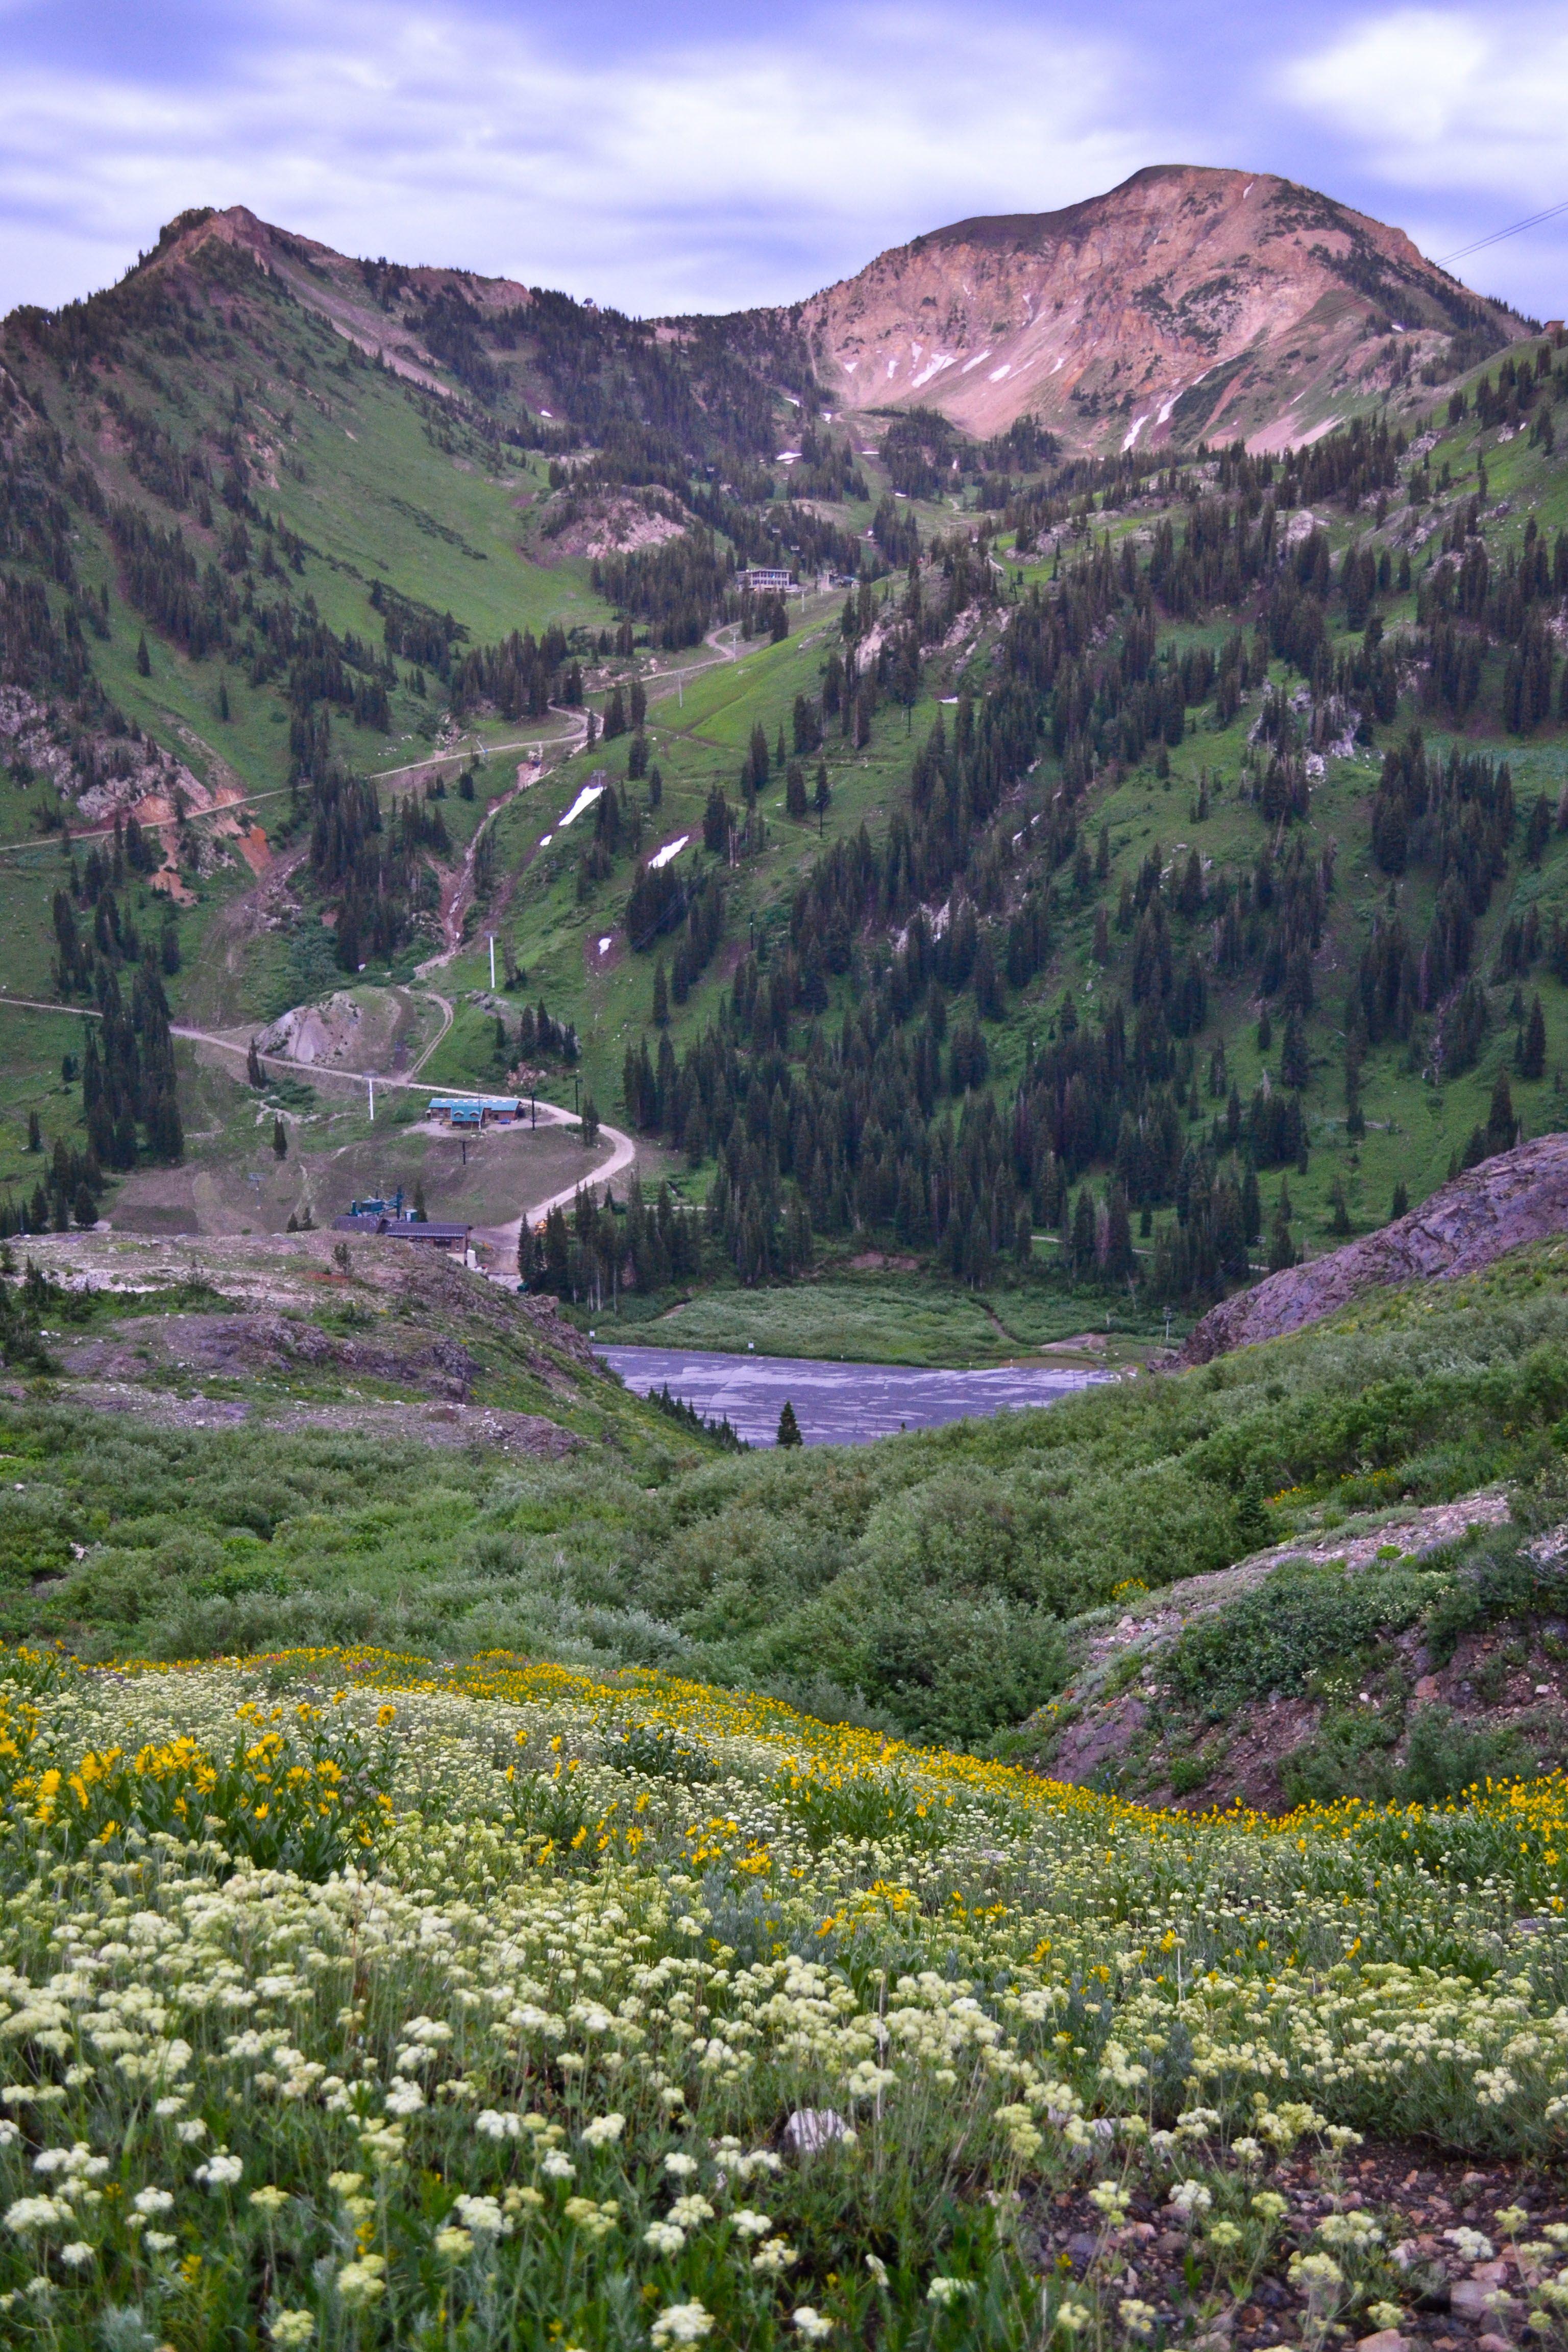 Cardiff Pass Hike Utah hikes, Hiking, Breathtaking views